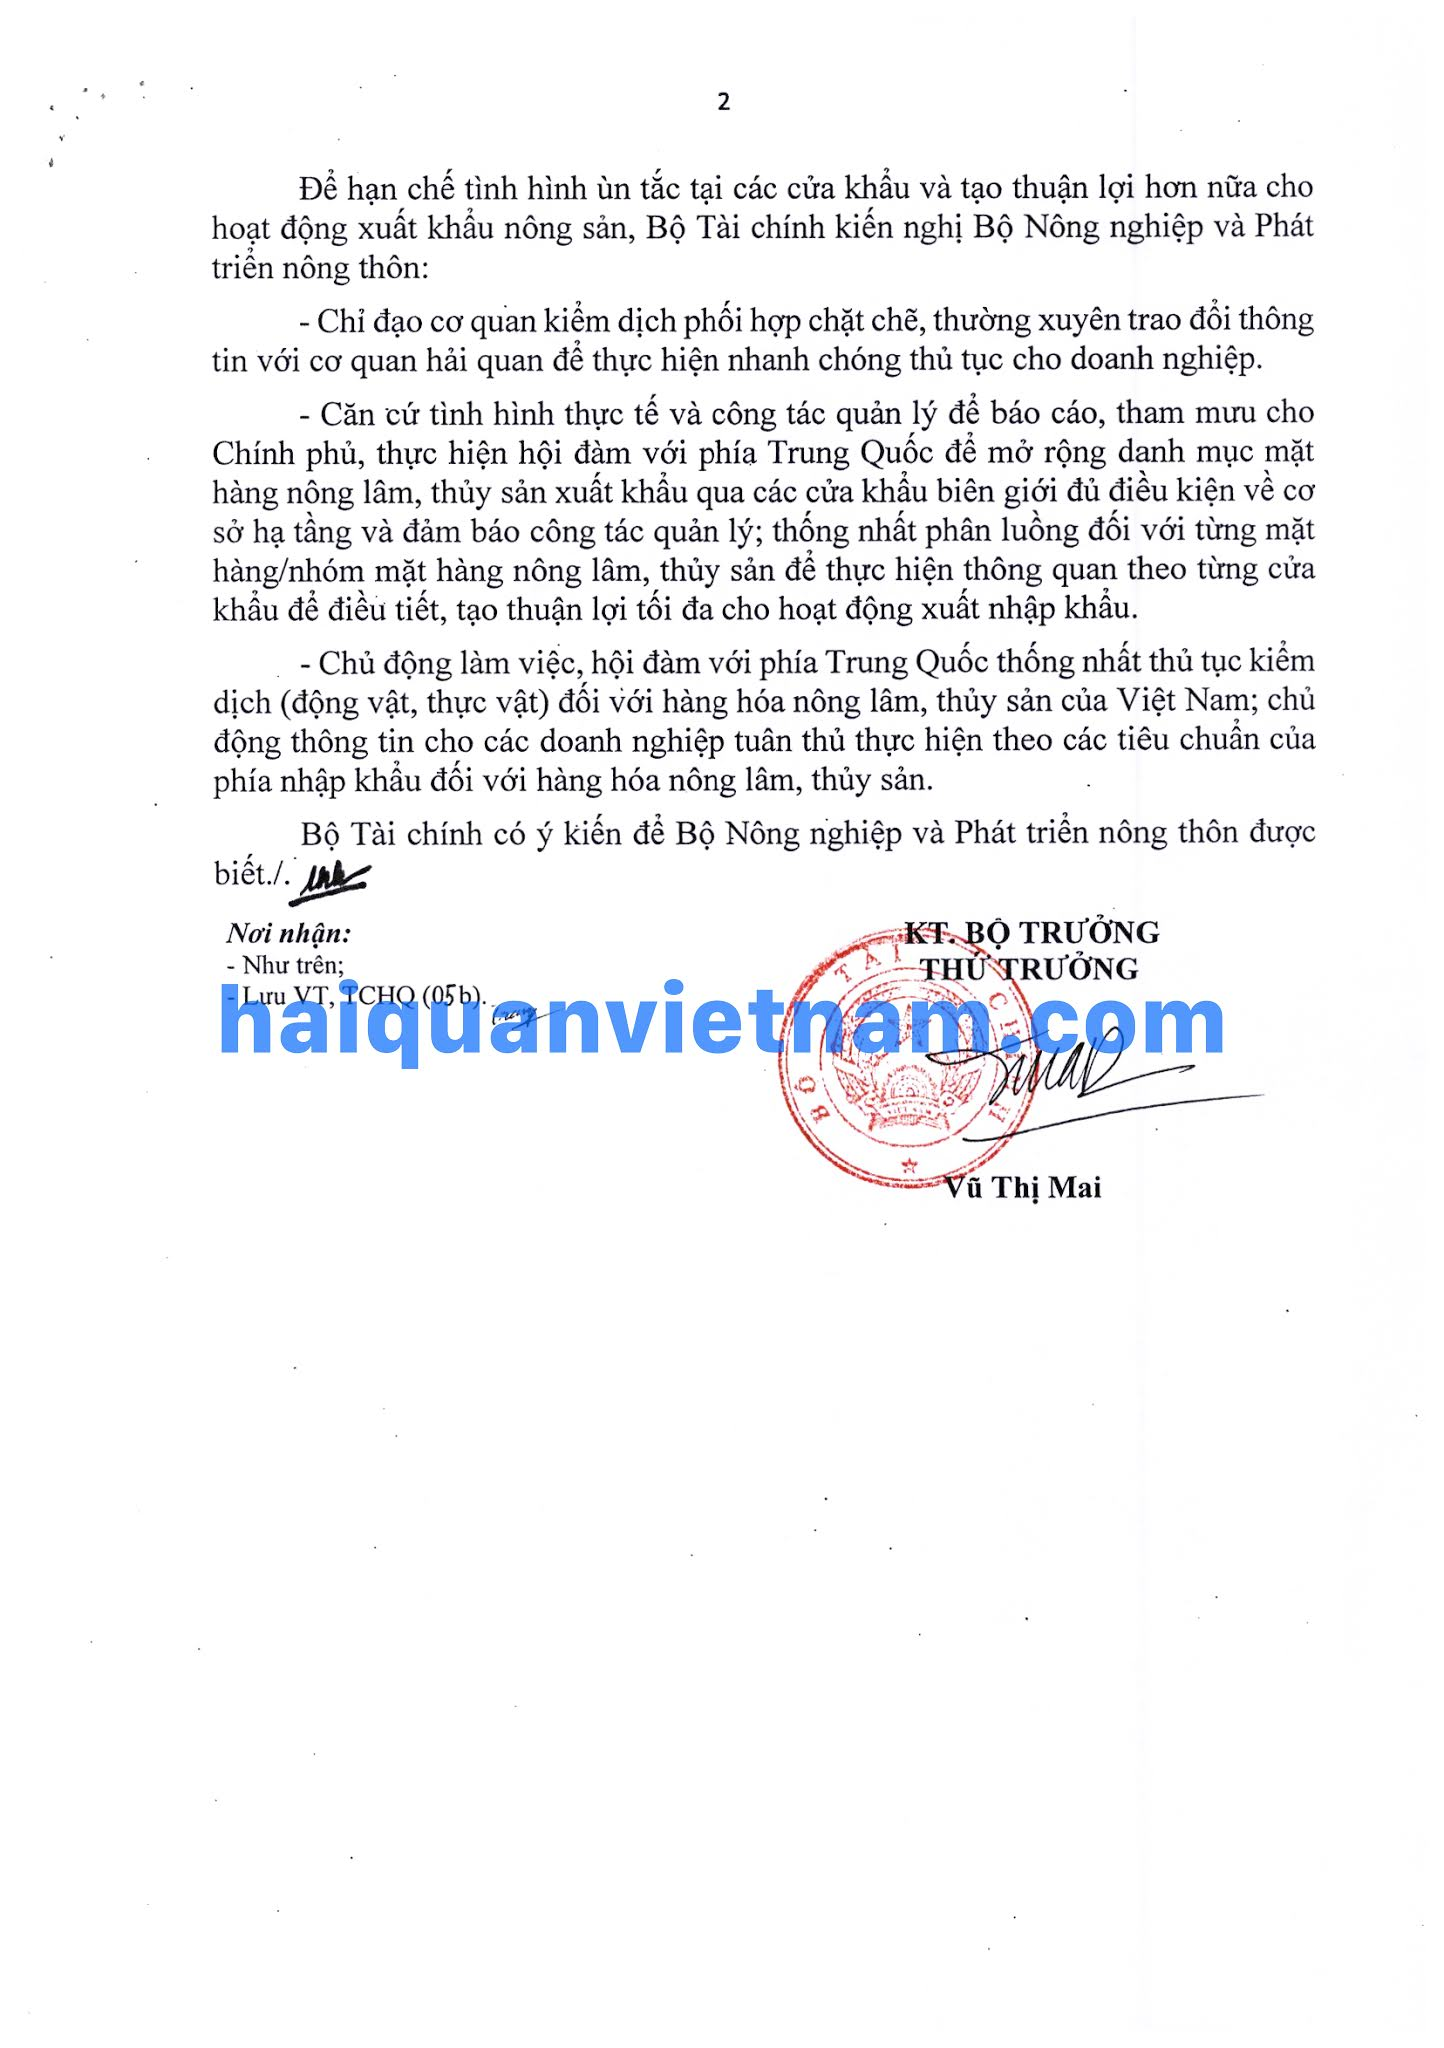 [Image: 210614_6338_BTC-TCHQ_haiquanvietnam_02.jpg]